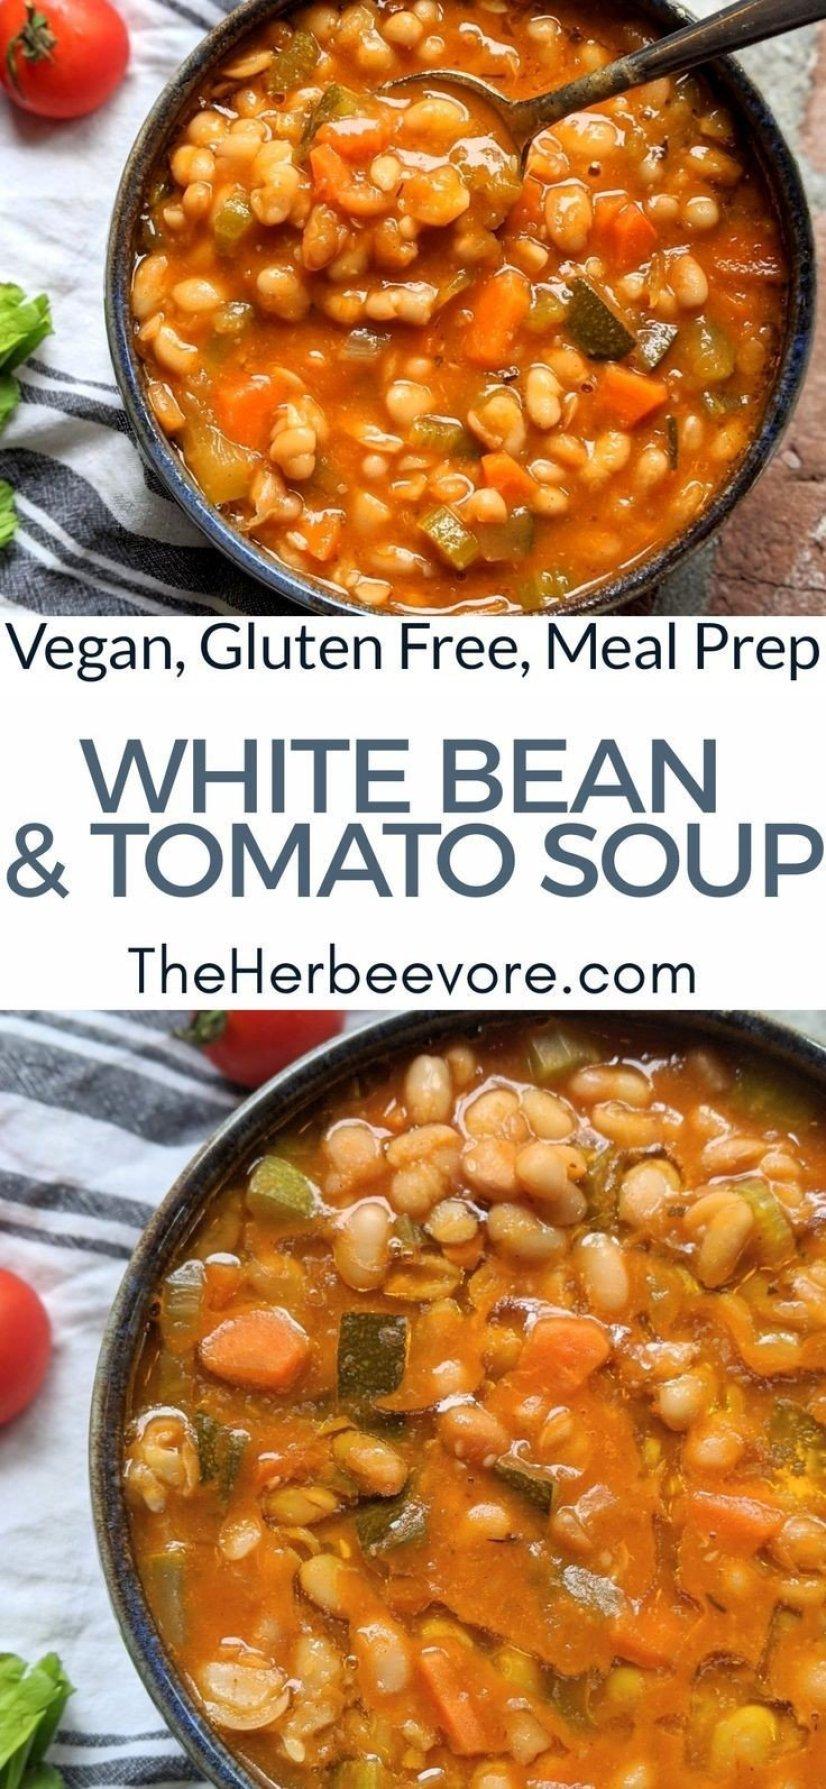 fasolatha fasolada greek white bean soup recipe meal prep vegan gluten free healthy recipes the whole family will love for fall or winter